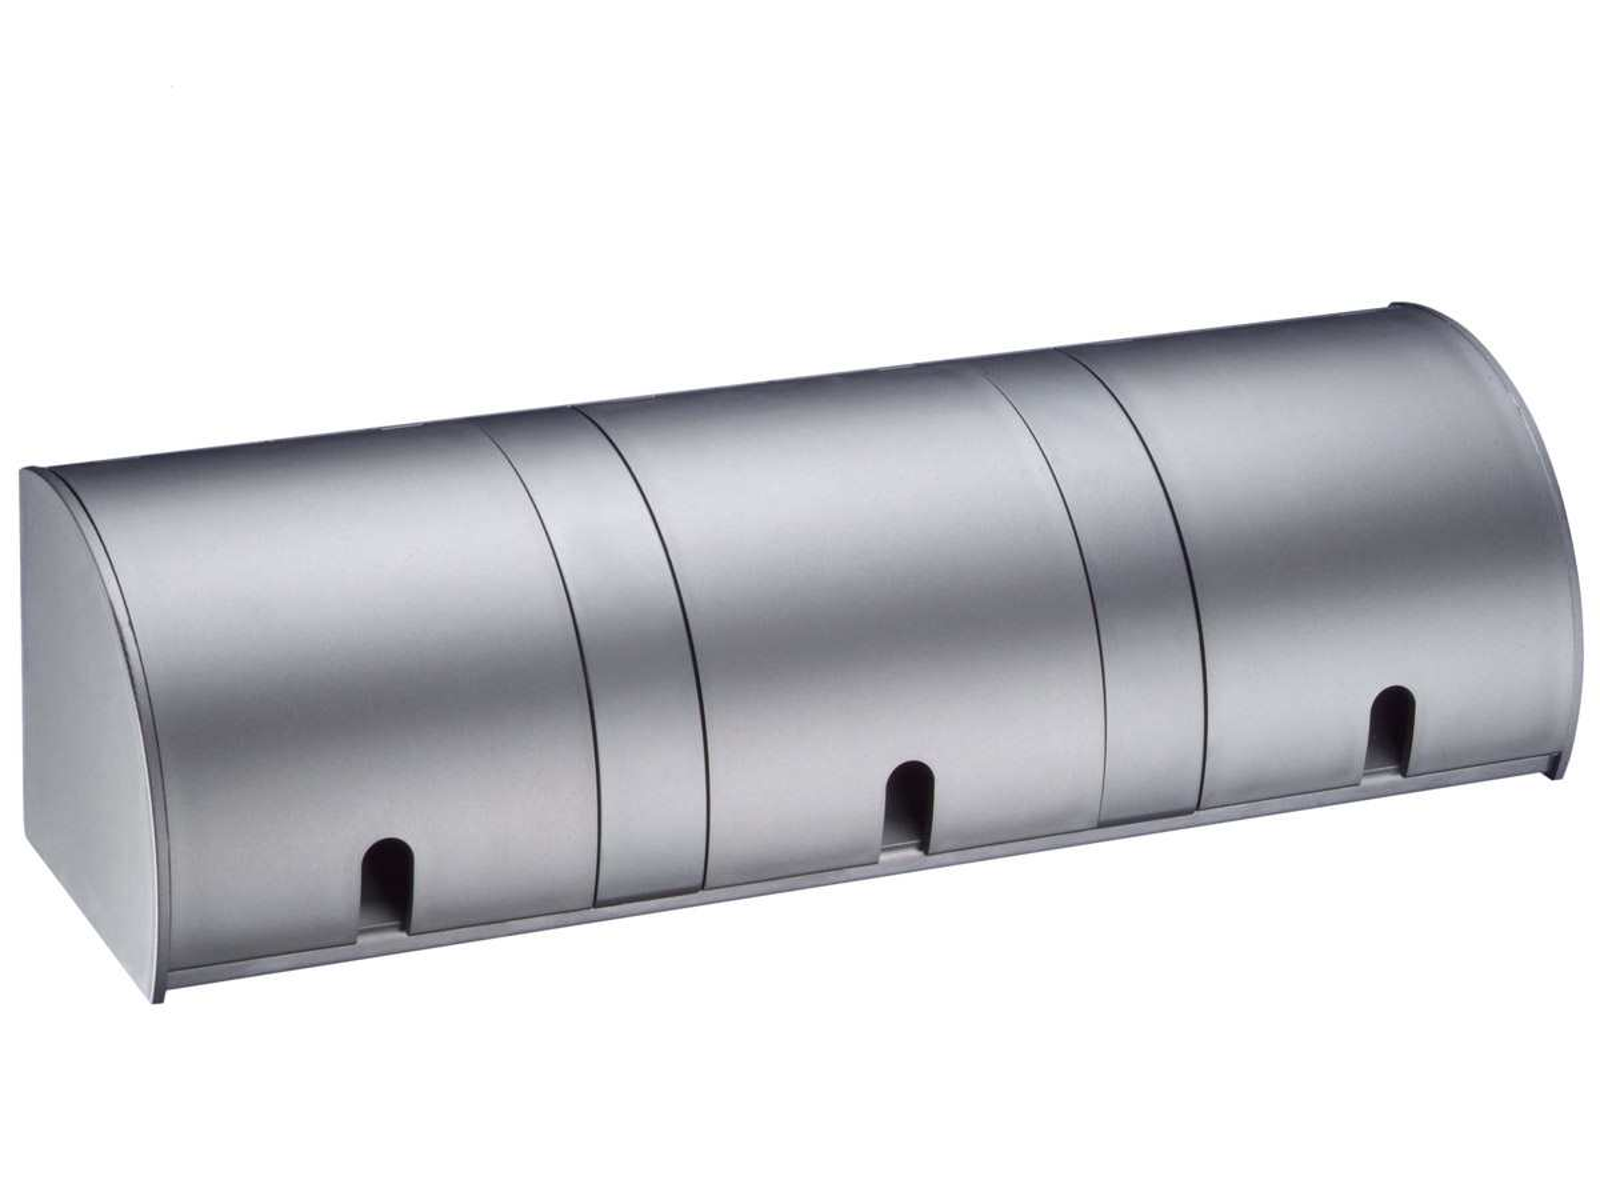 Thebo E 1000/ST 3 - 19107 ST 3 Steckdosenelement Aluminium